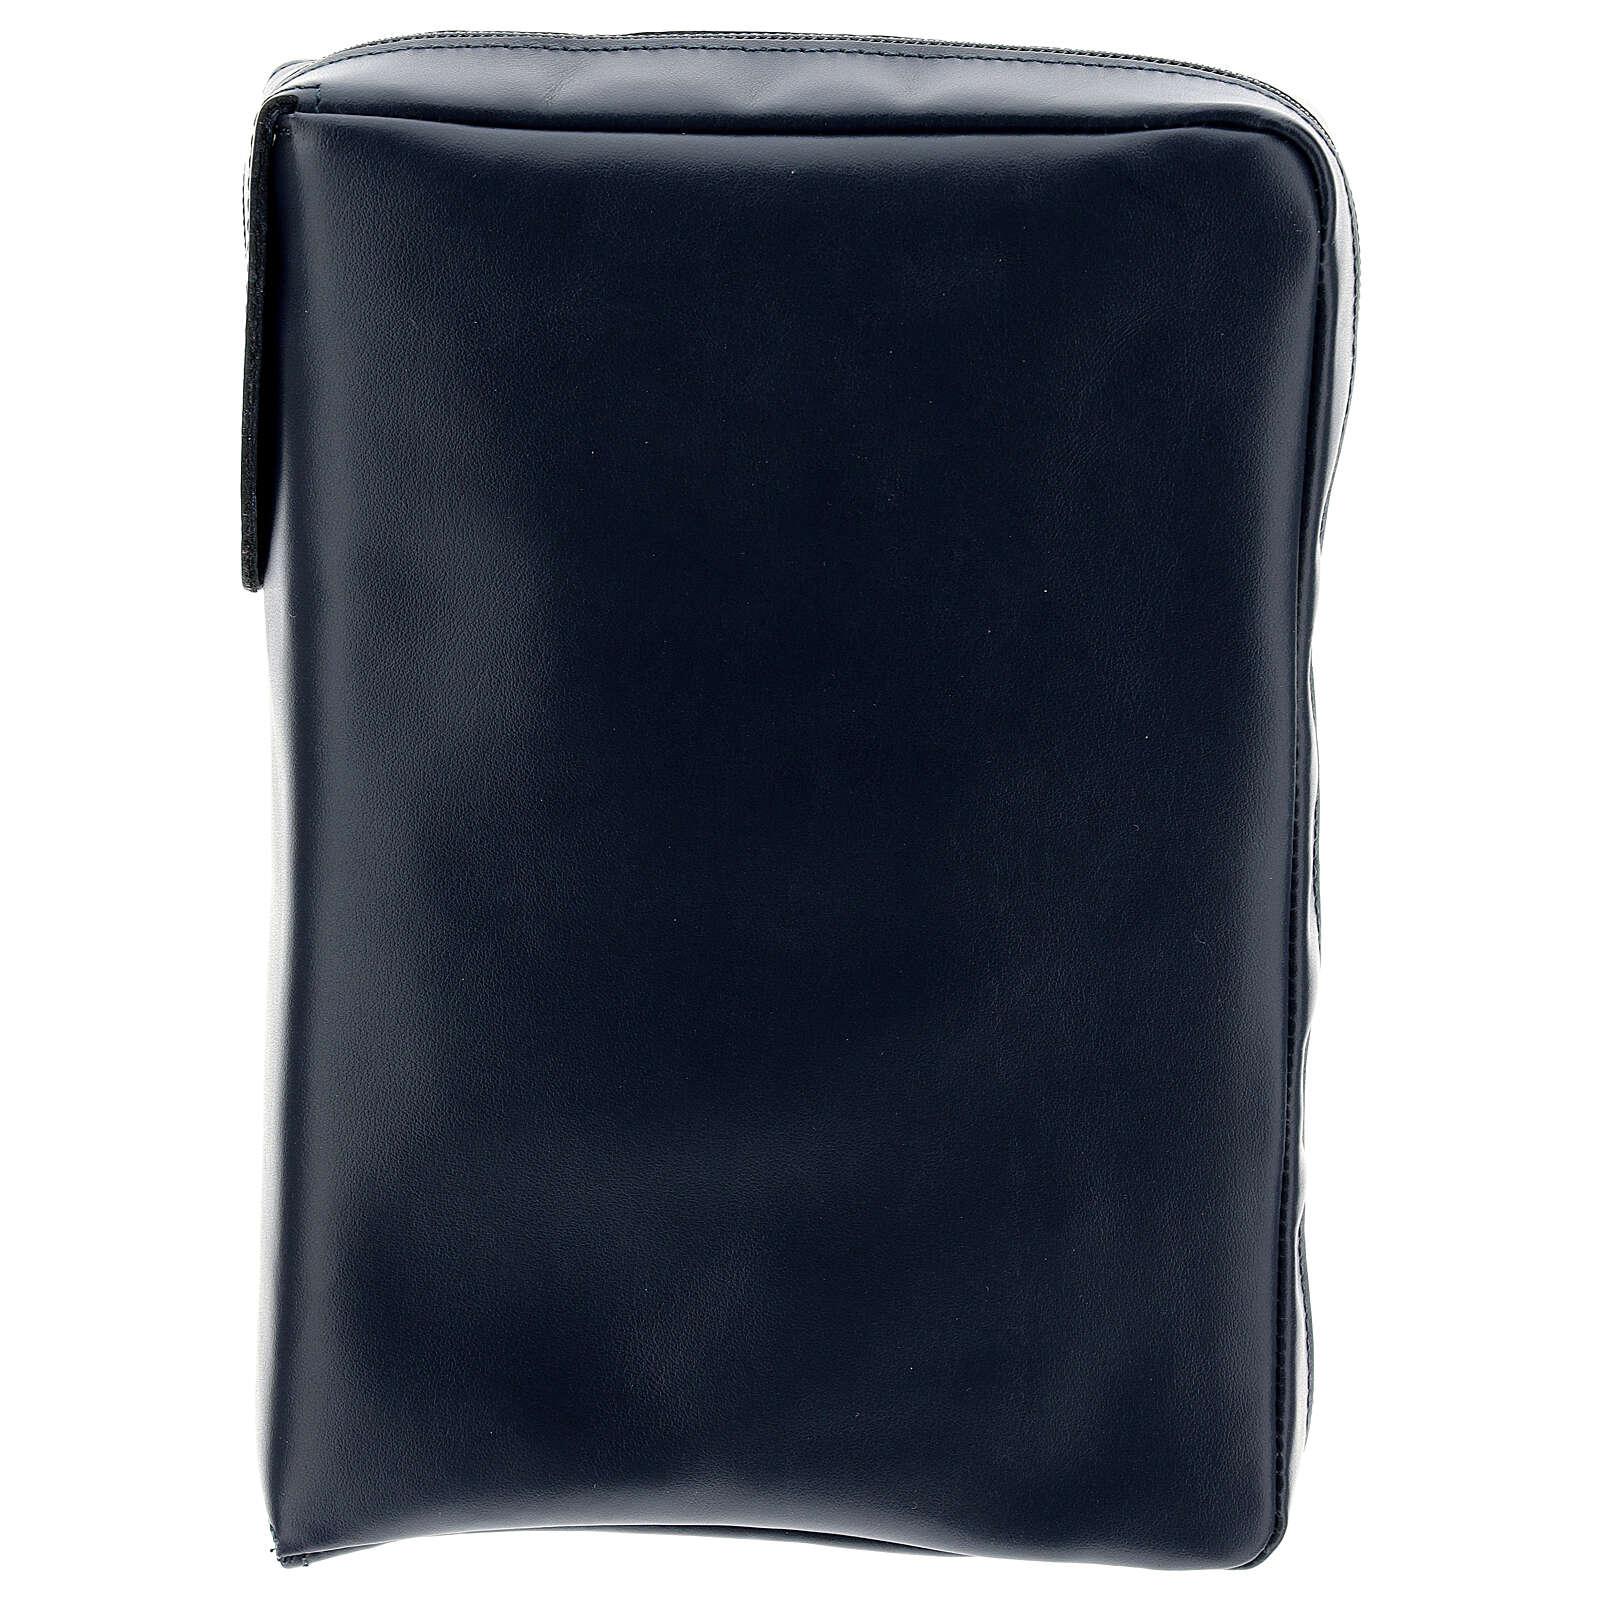 Custodia vera pelle blu Nuova Bibbia San Paolo 2020 4